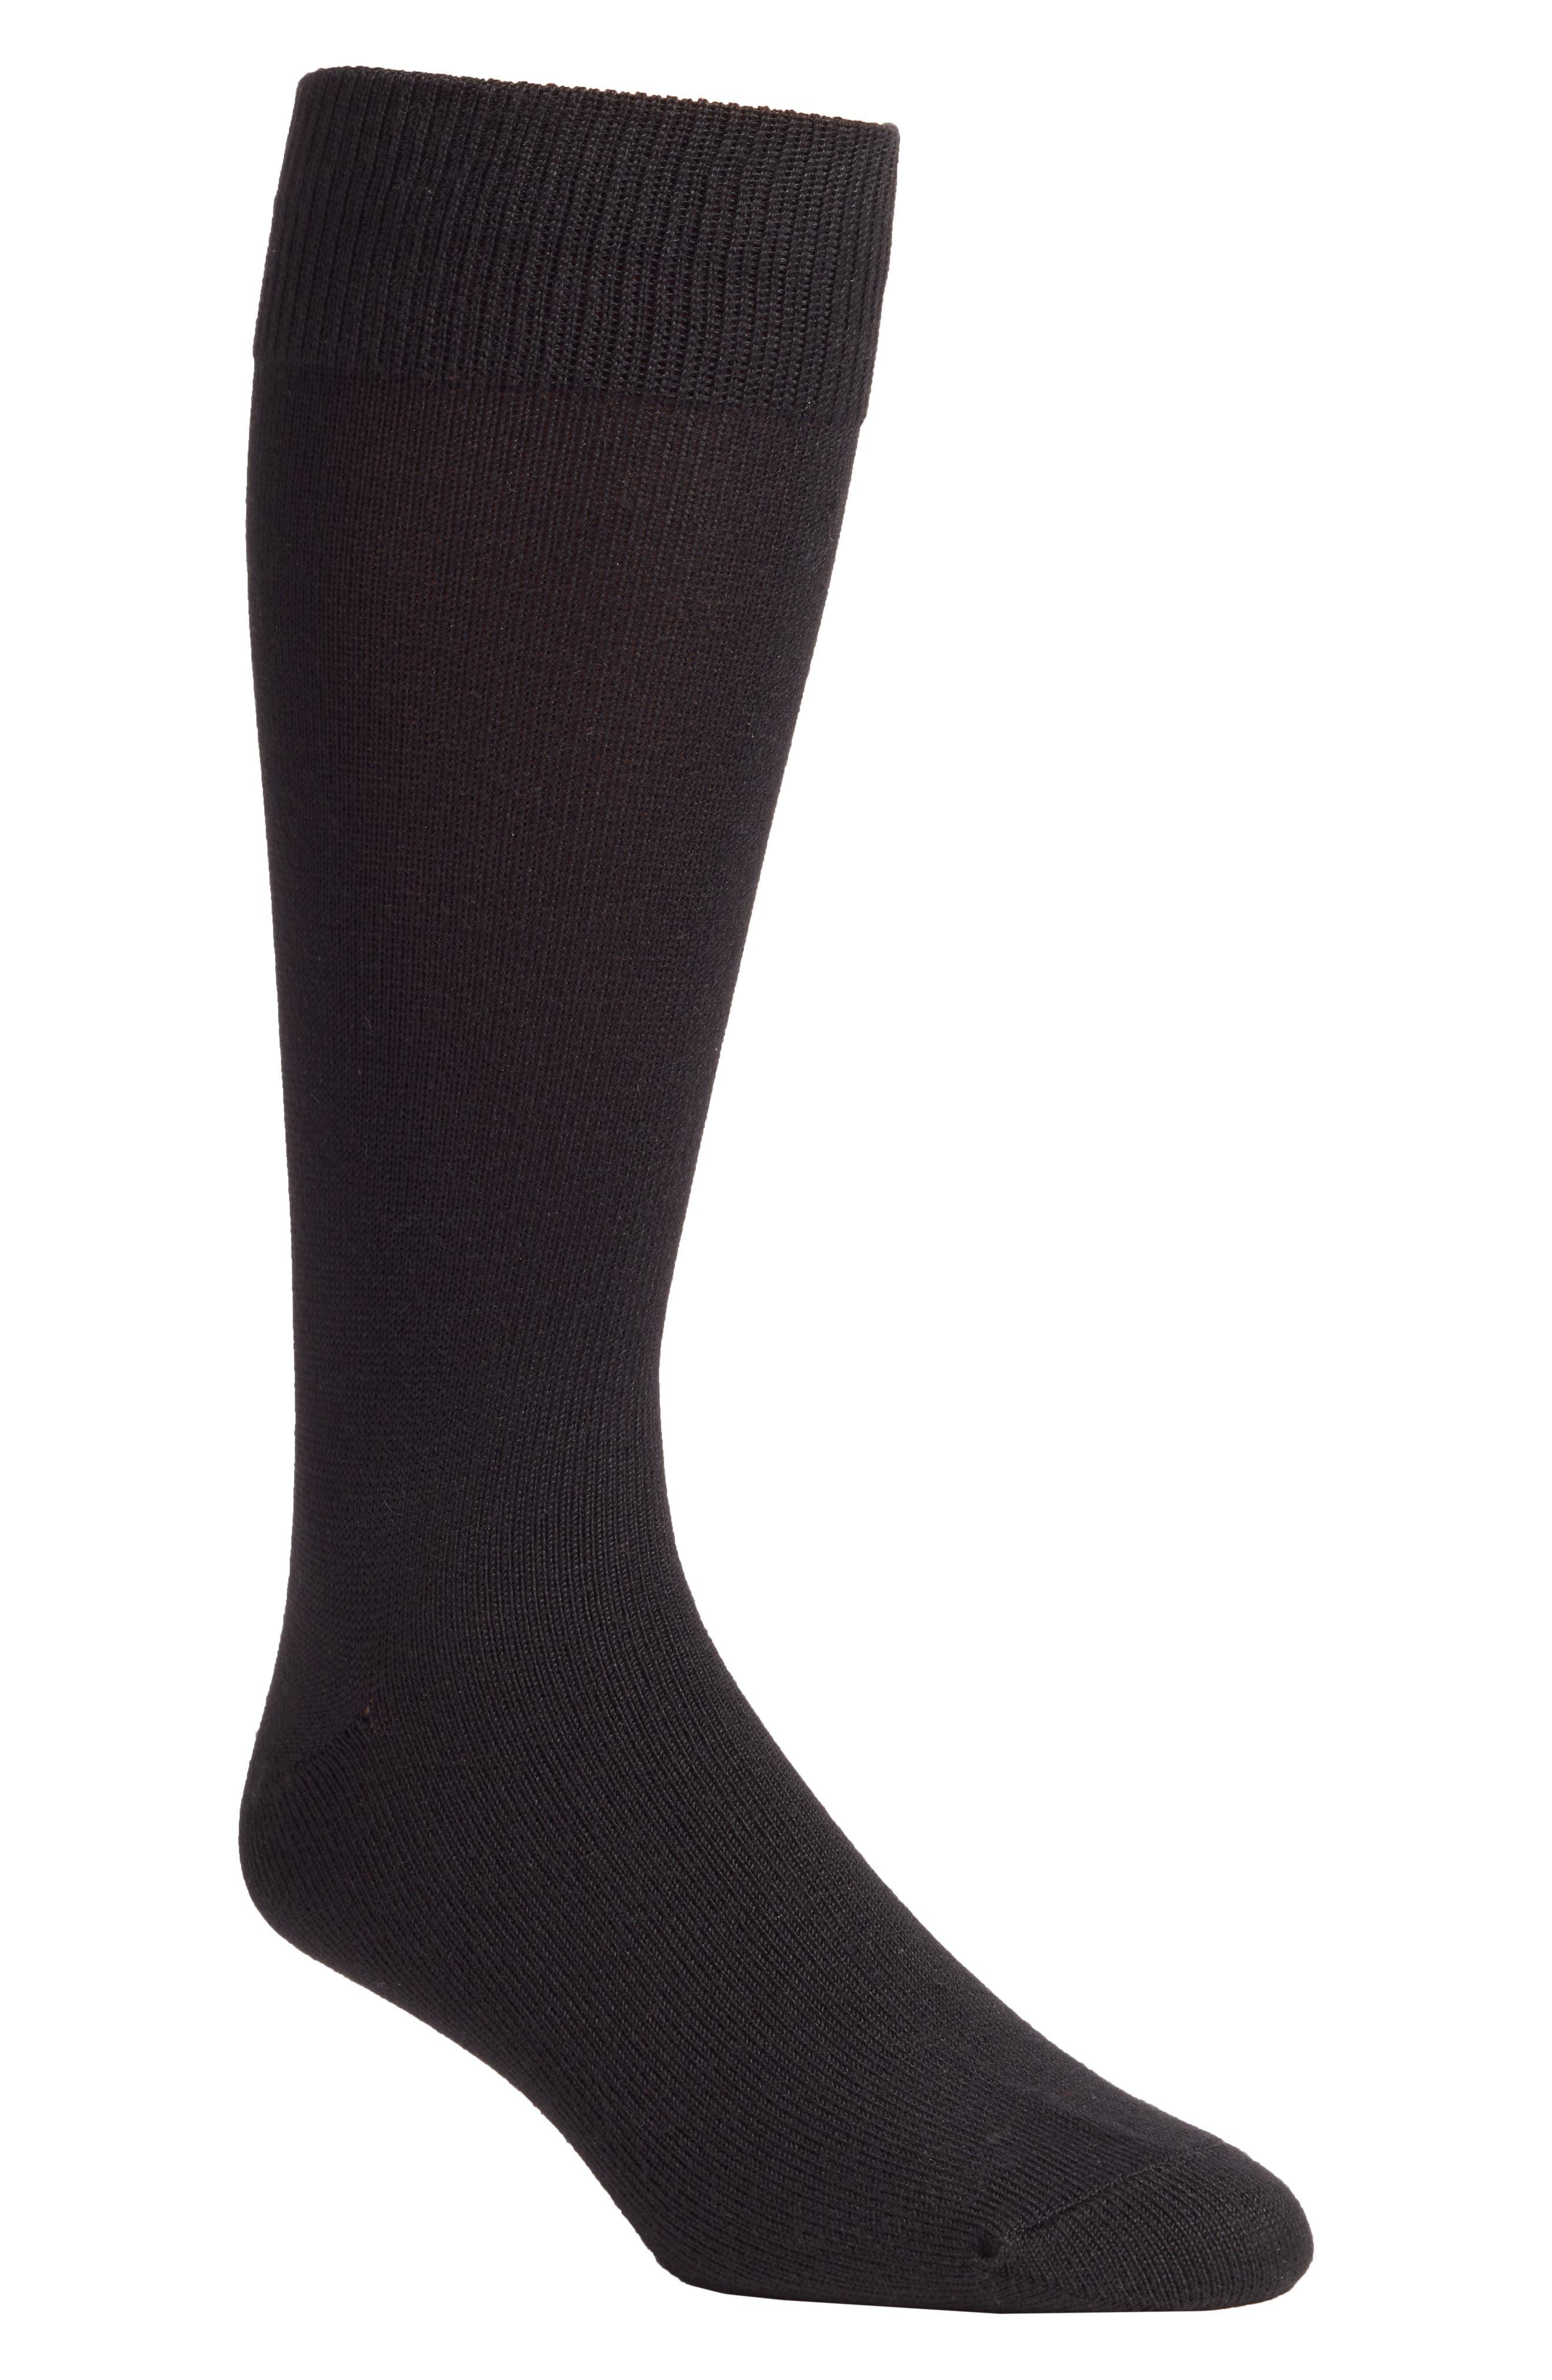 NORDSTROM MEN'S SHOP, Ultra Soft Socks, Main thumbnail 1, color, BLACK